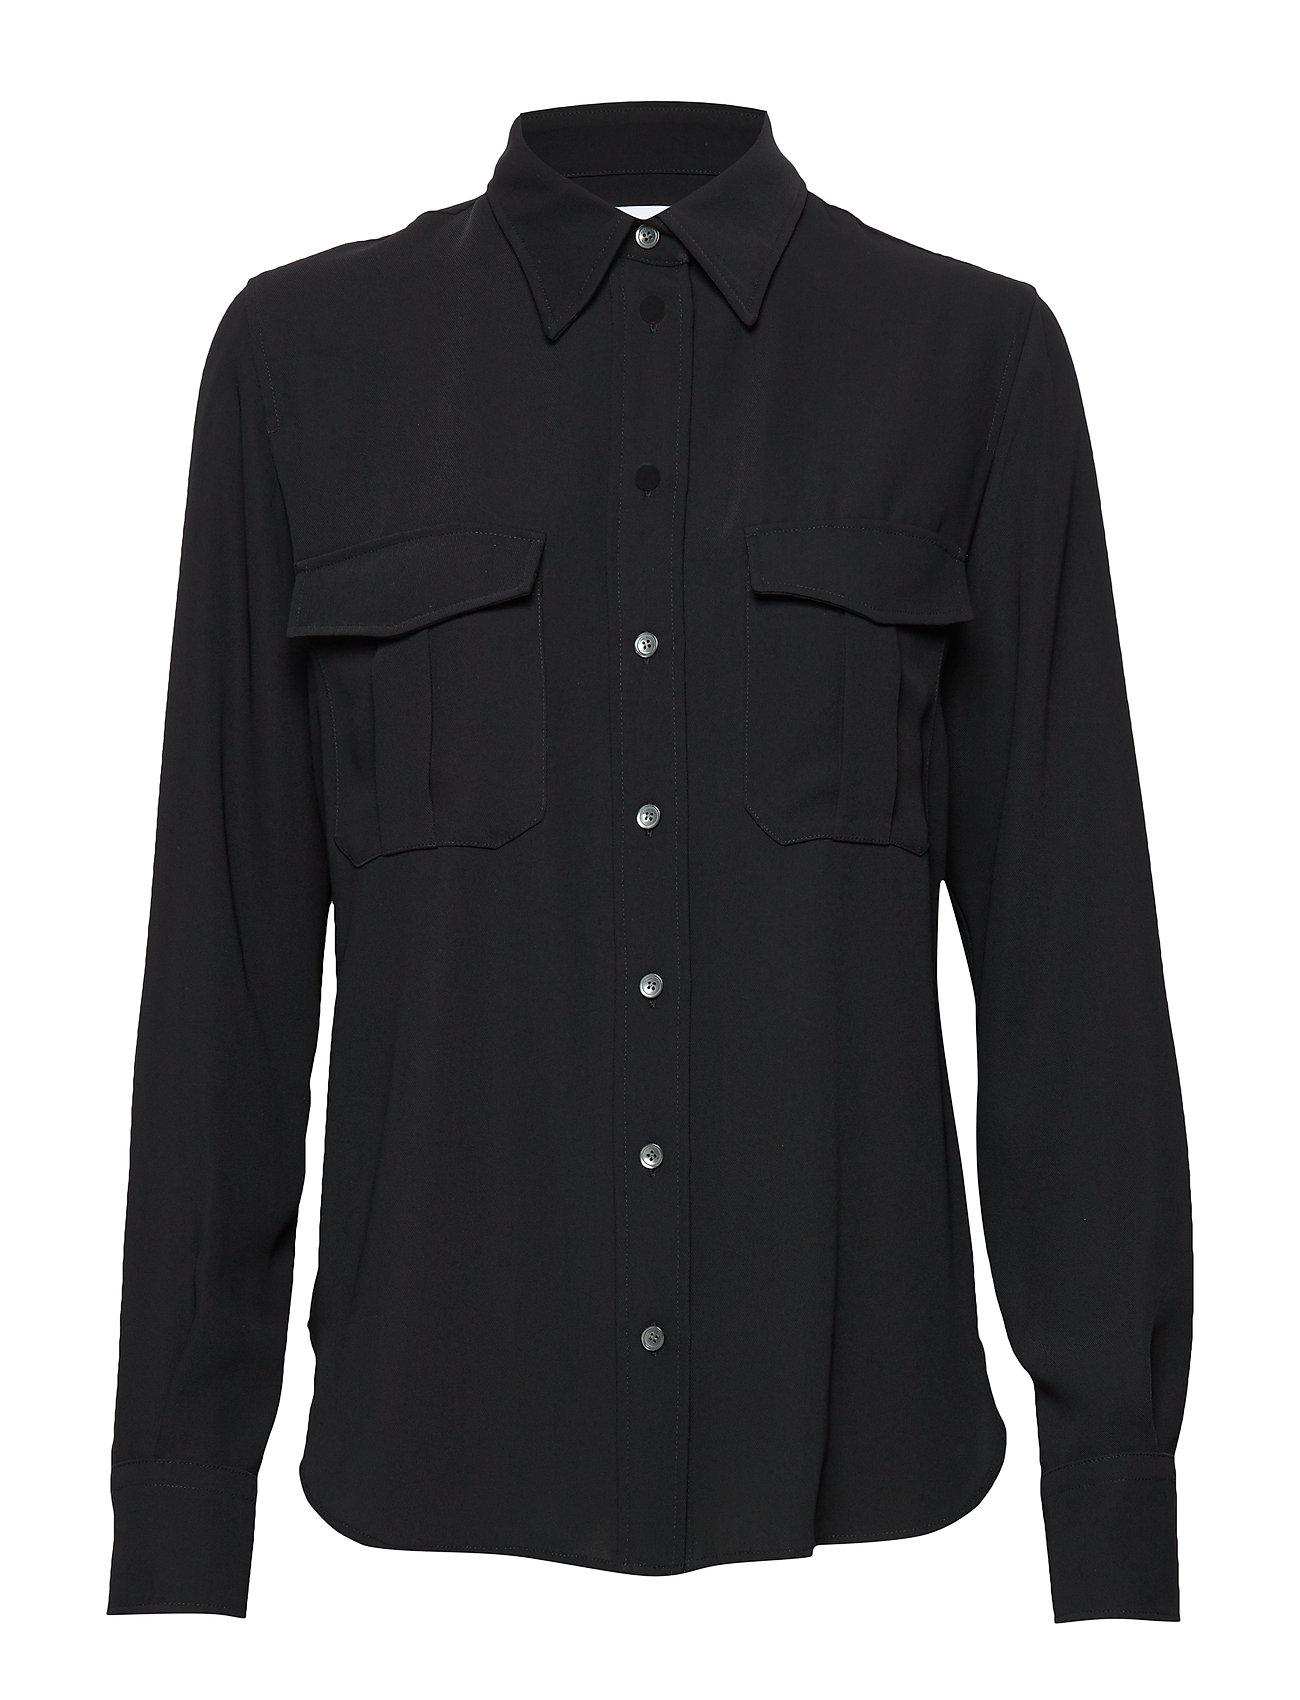 Calvin Klein SMOOTH TWILL POLICE PKT SHIRT - CALVIN BLACK